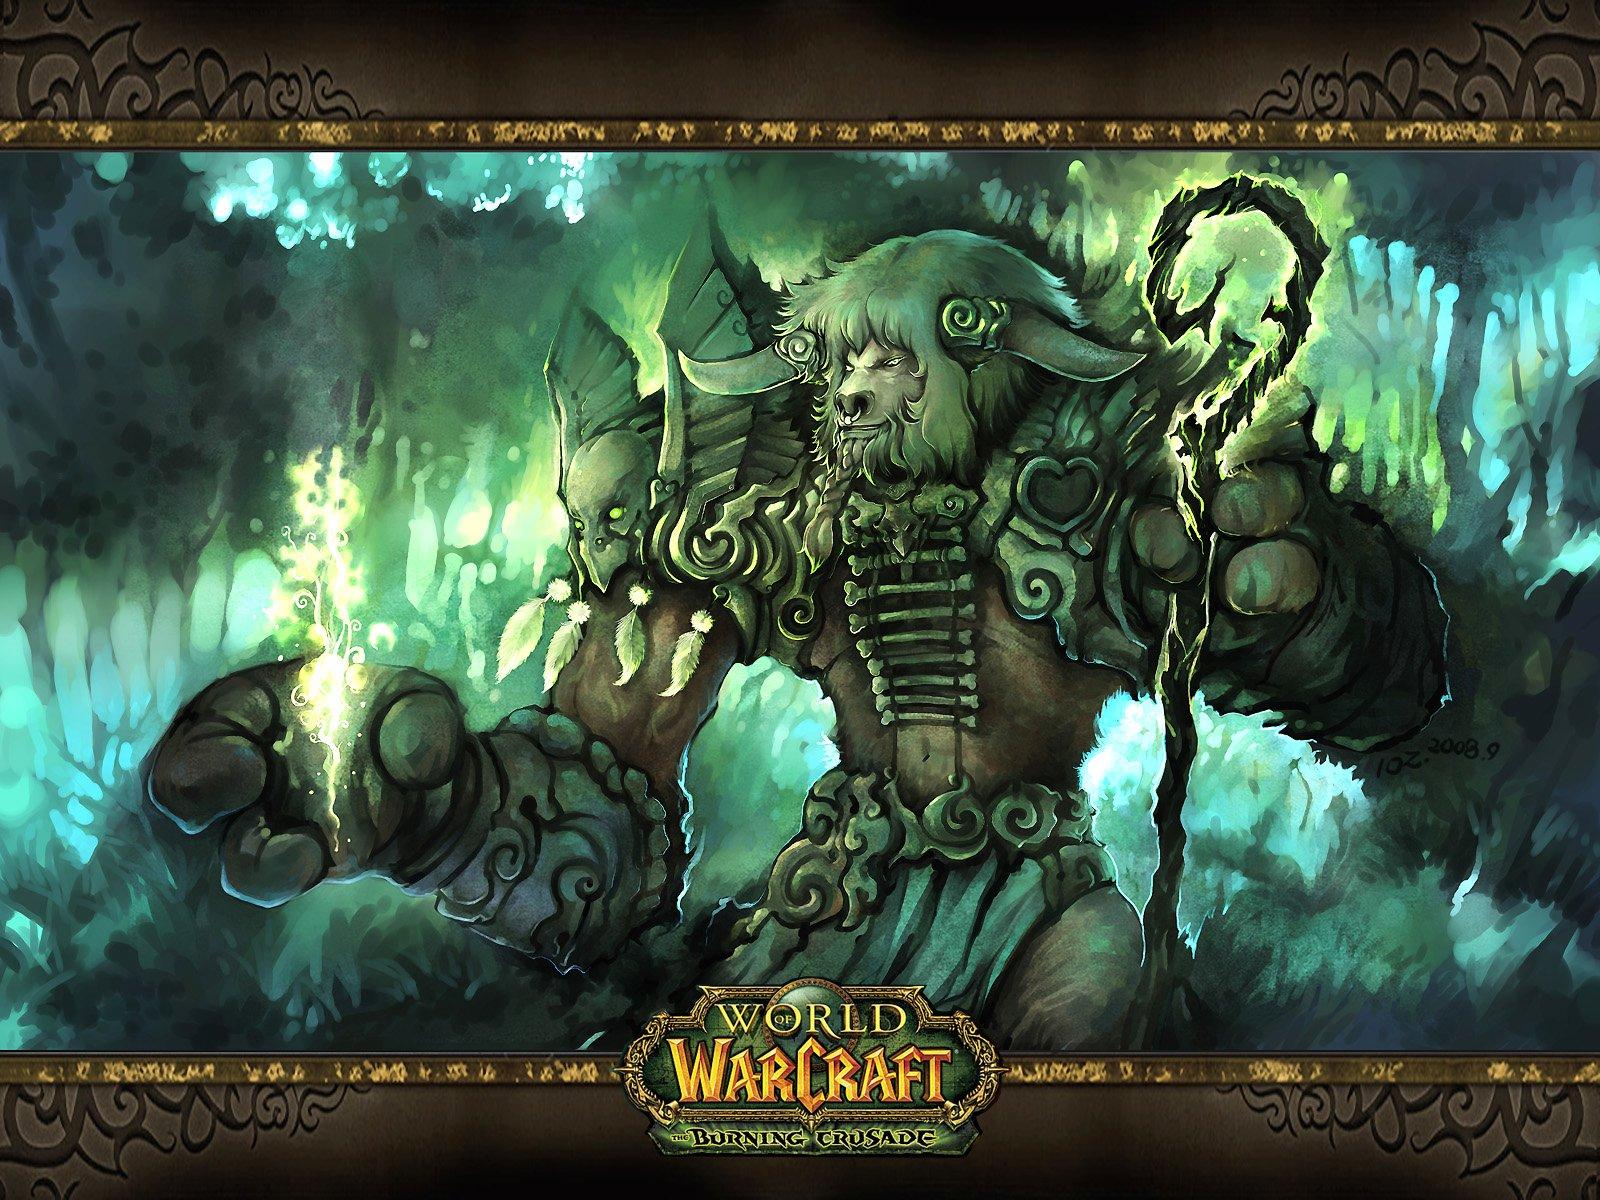 World Of Warcraft The Burning Crusade Fondo De Pantalla And